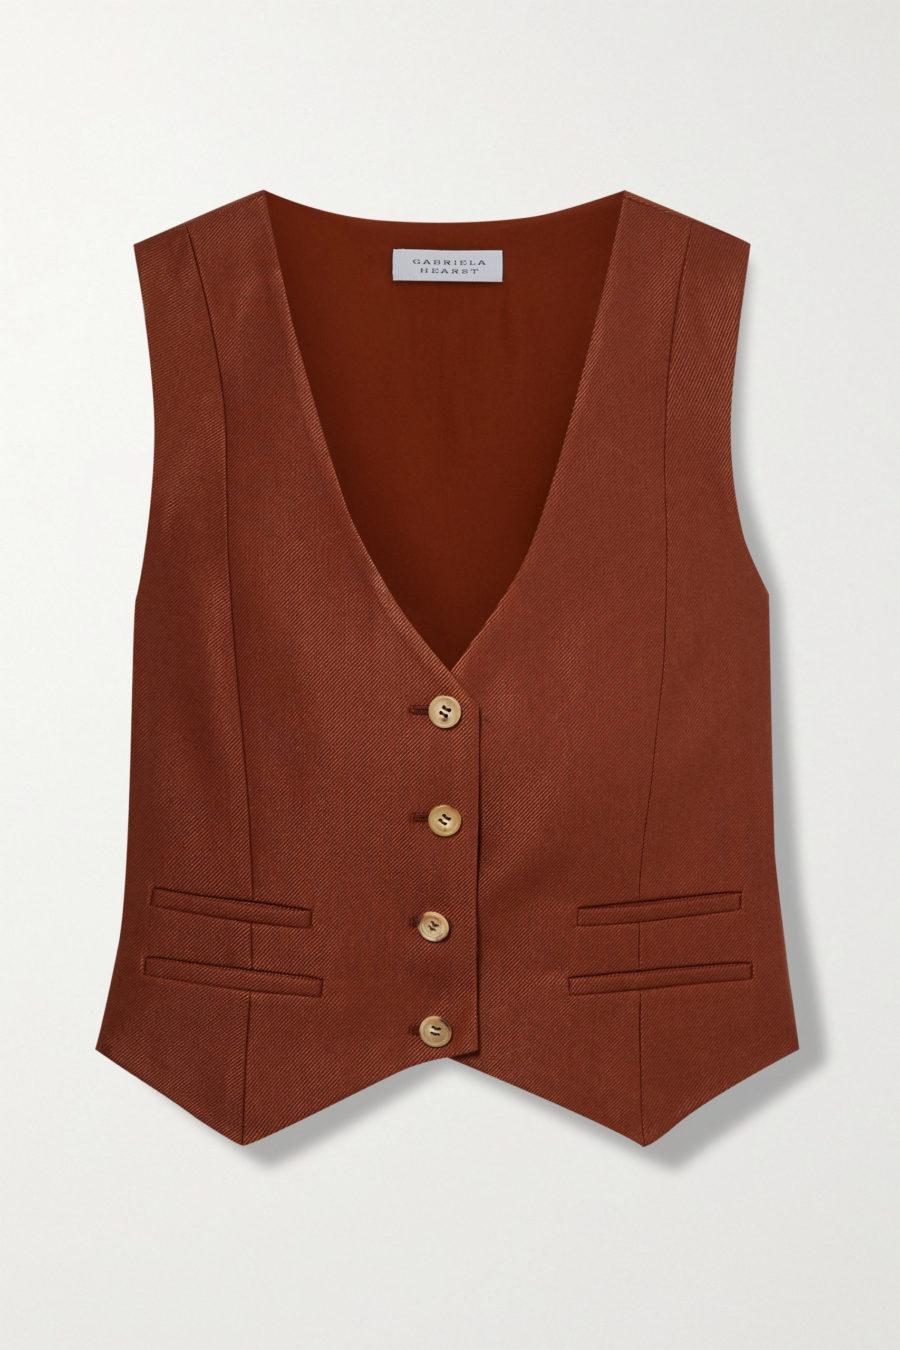 Gabriela Hearst Zelos wool and silk-blend twill vest ($850)